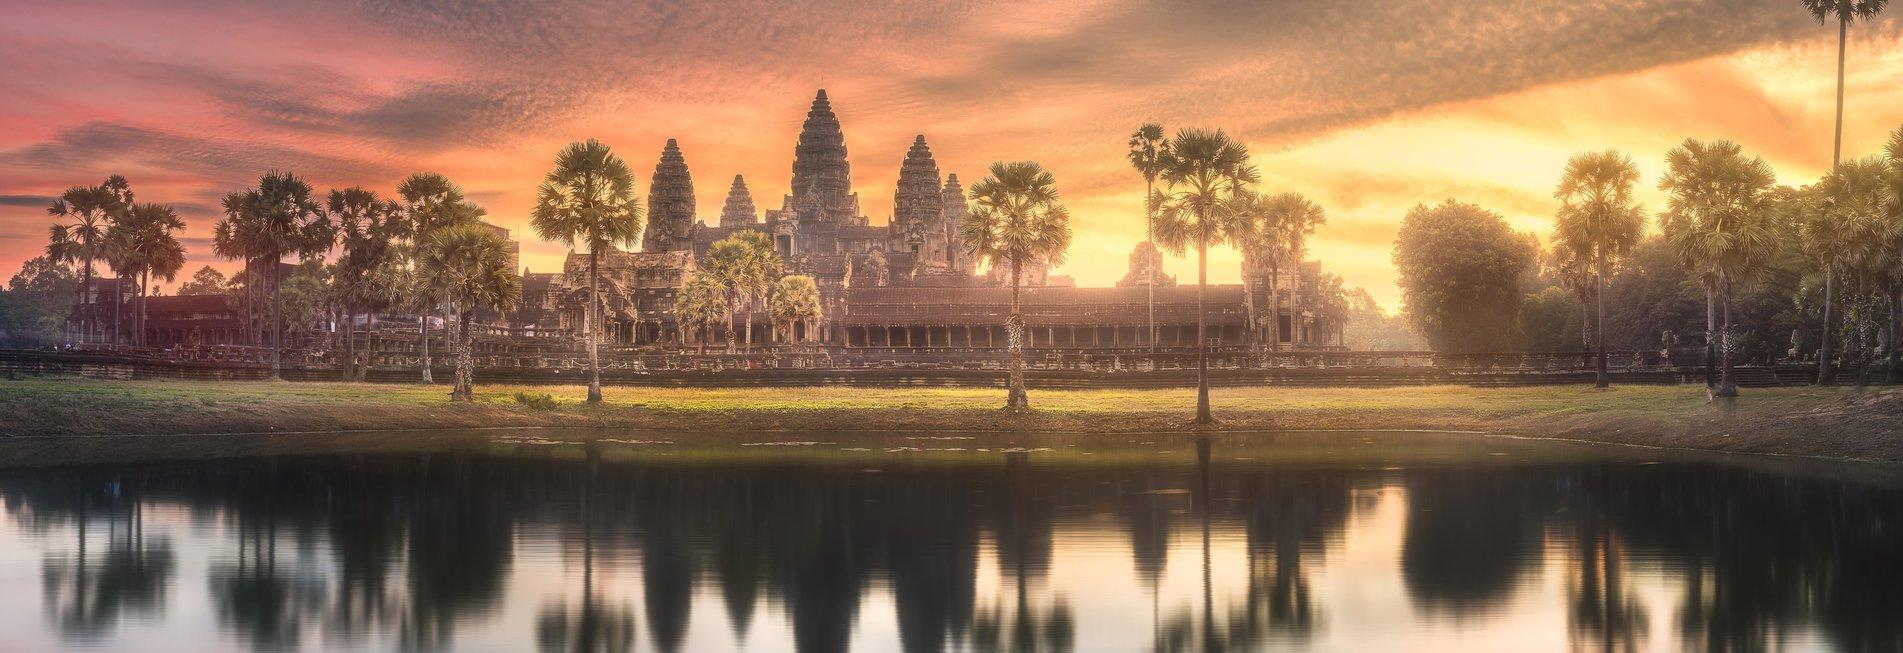 Flusskreuzfahrt - RV Mekong Prestige II: Thailand, Kambodscha, Vietnam